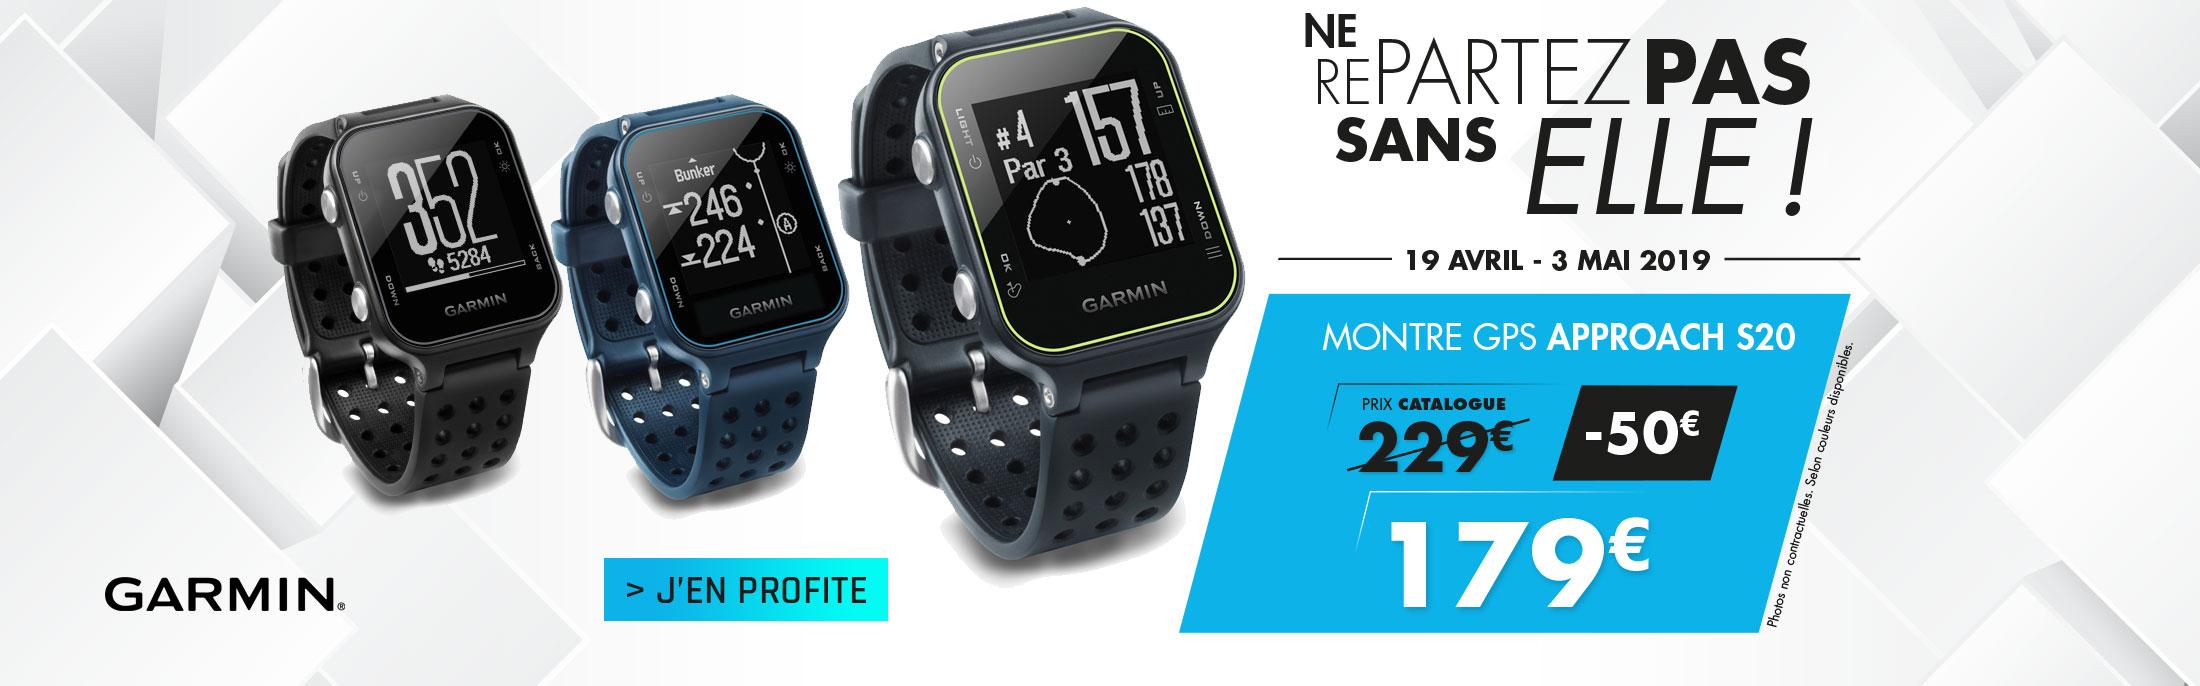 Montre GPS GARMIN APPROACH S20 !